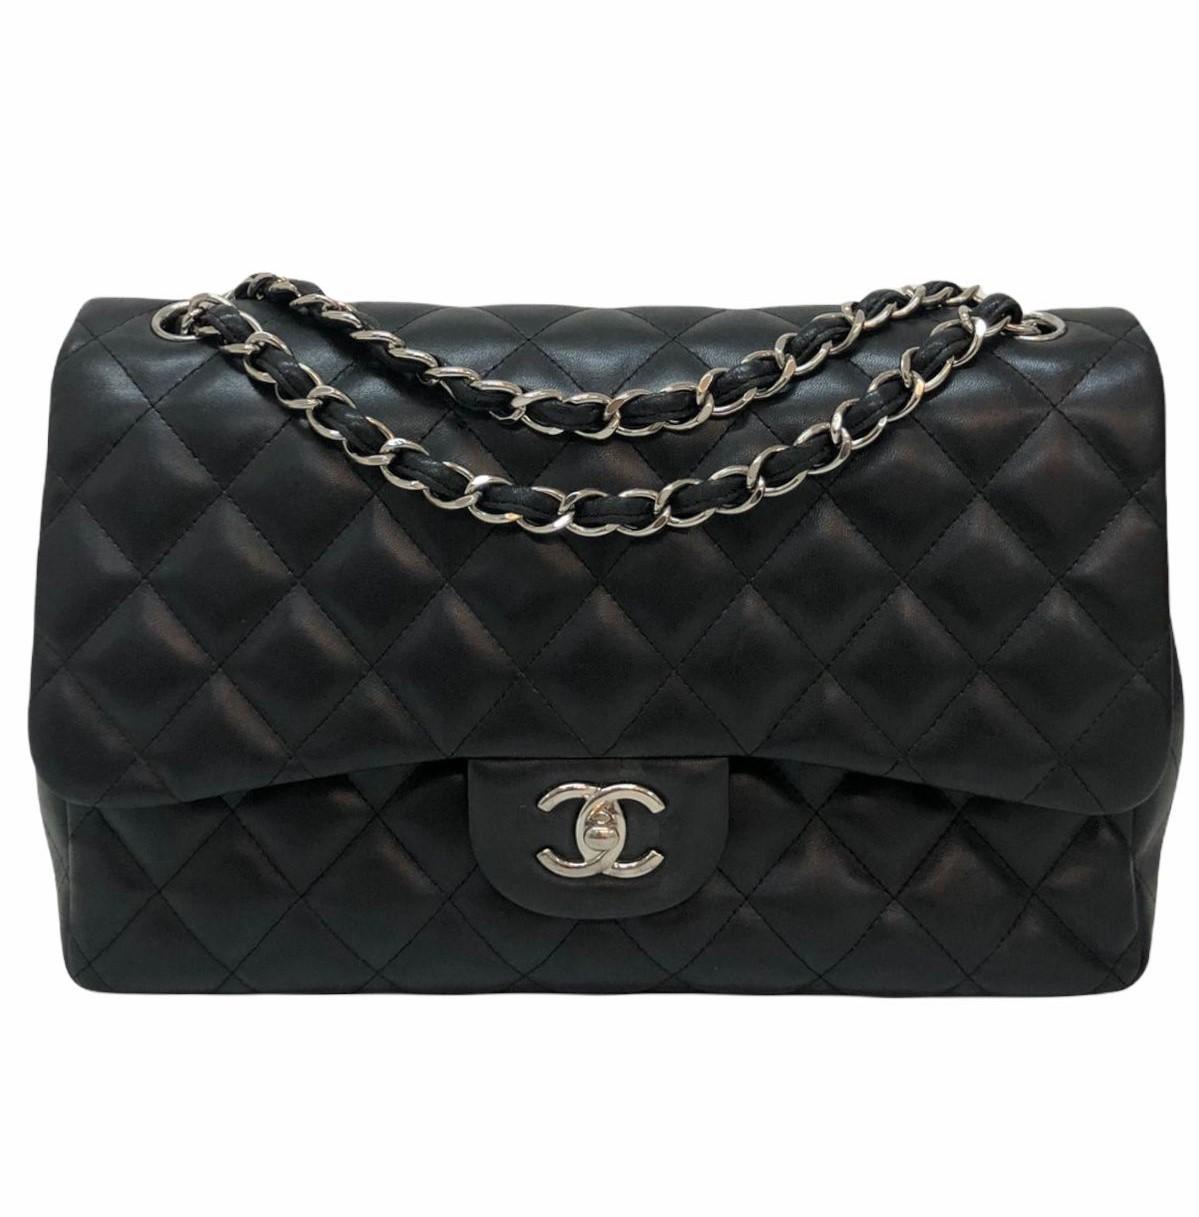 Bolsa Chanel Classic Double Flap Jumbo Lambskin Preta